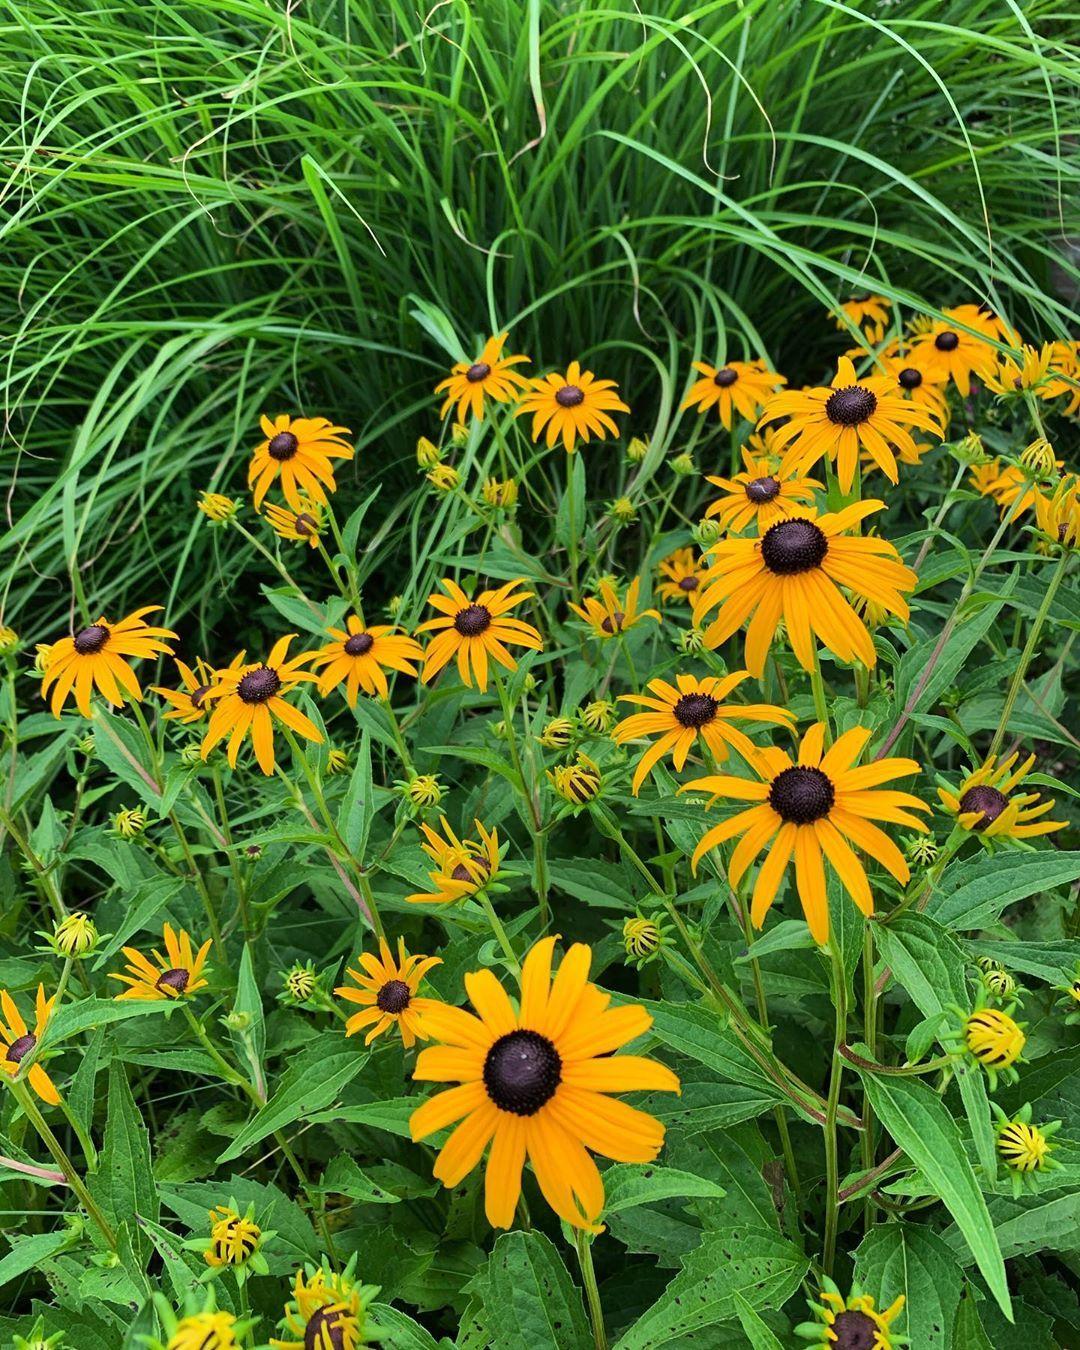 Black Eyed Susan Flowers Garden Summer Blomster Hage Sommer Garten Blumen Pflanzen Planter Plants Plants